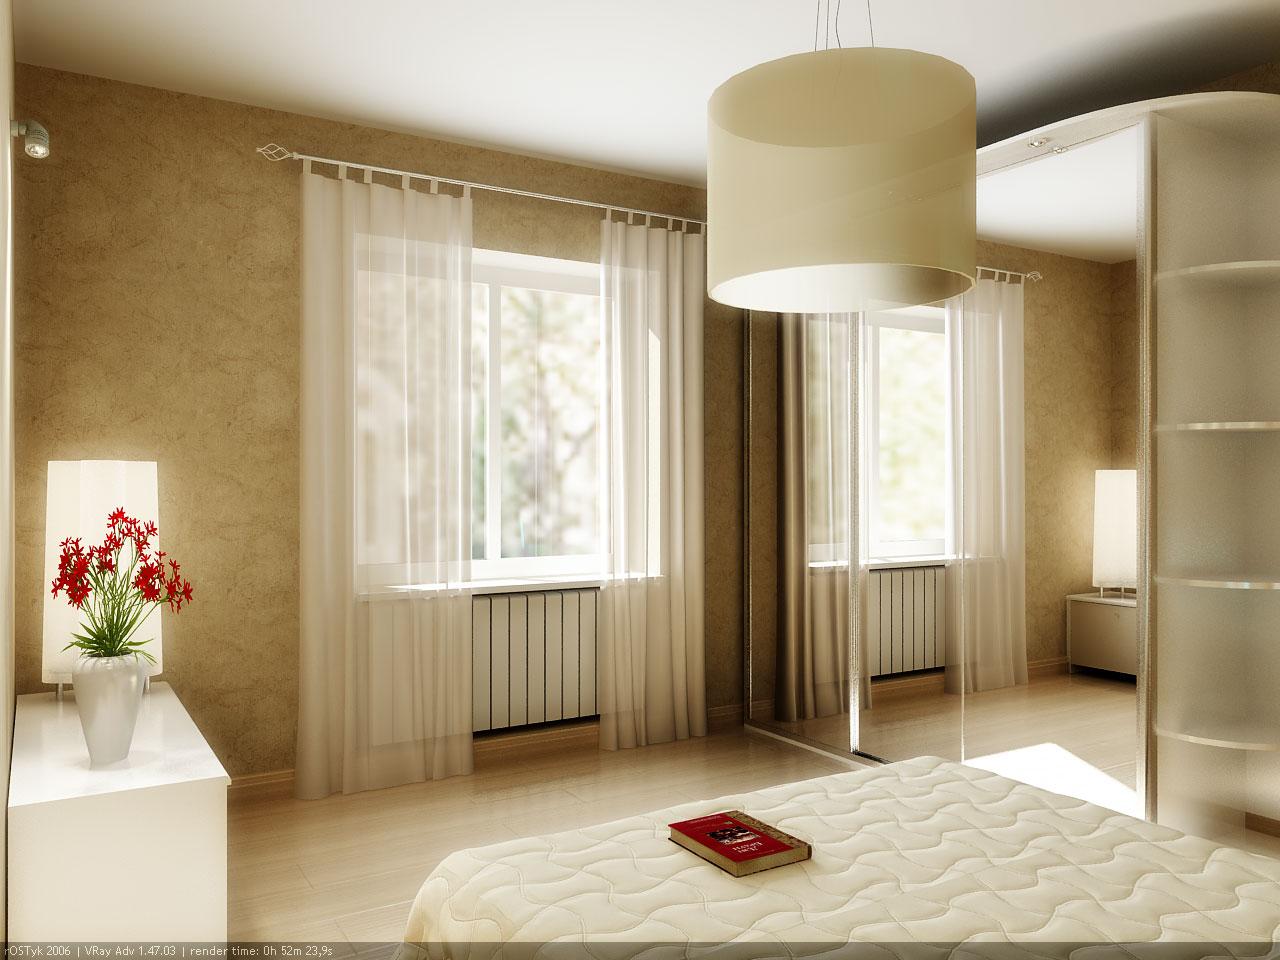 70 Interior Design for Desktop Wallpaper 1280x960